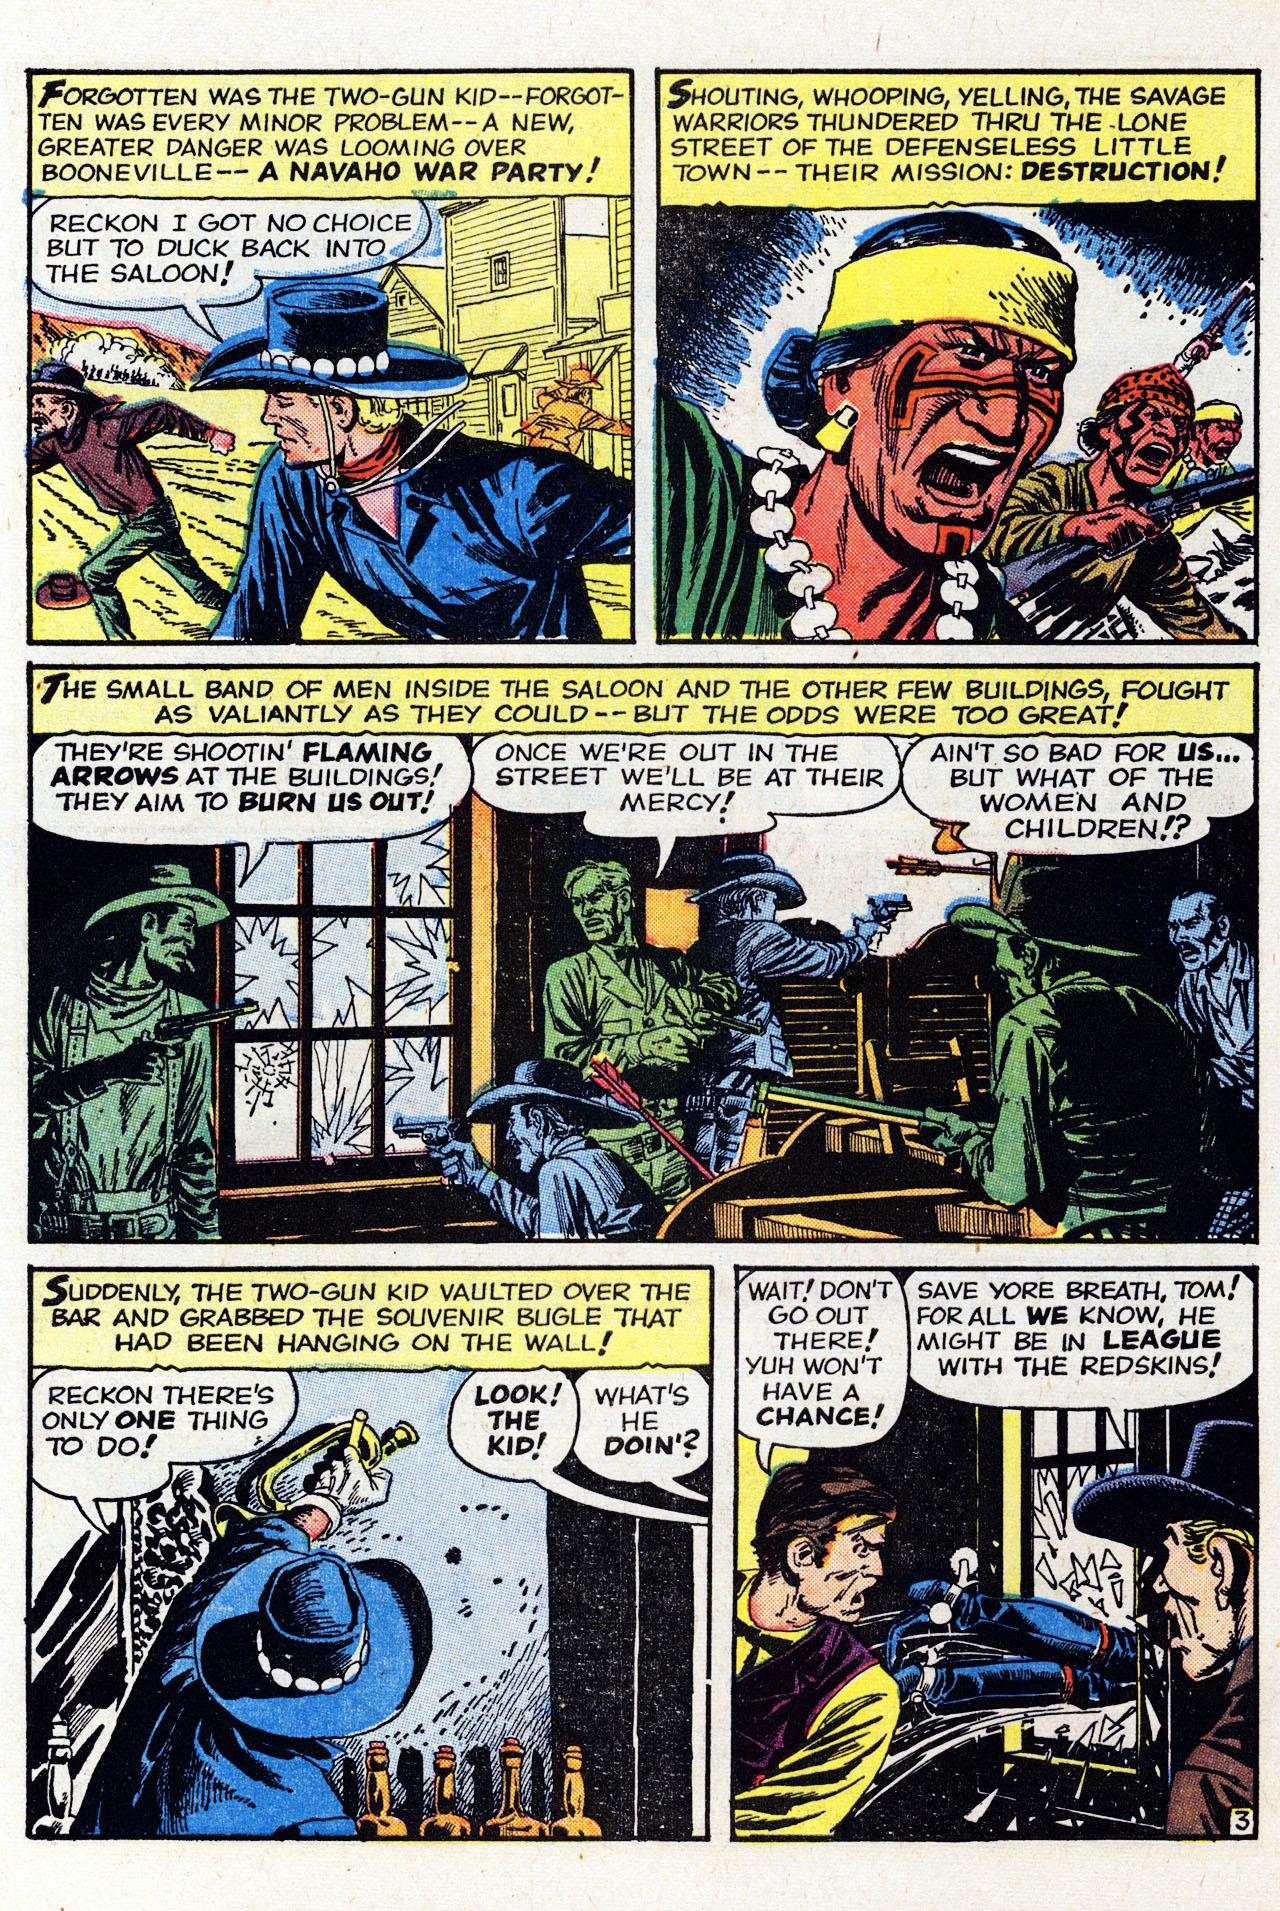 Read online Two-Gun Kid comic -  Issue #53 - 30